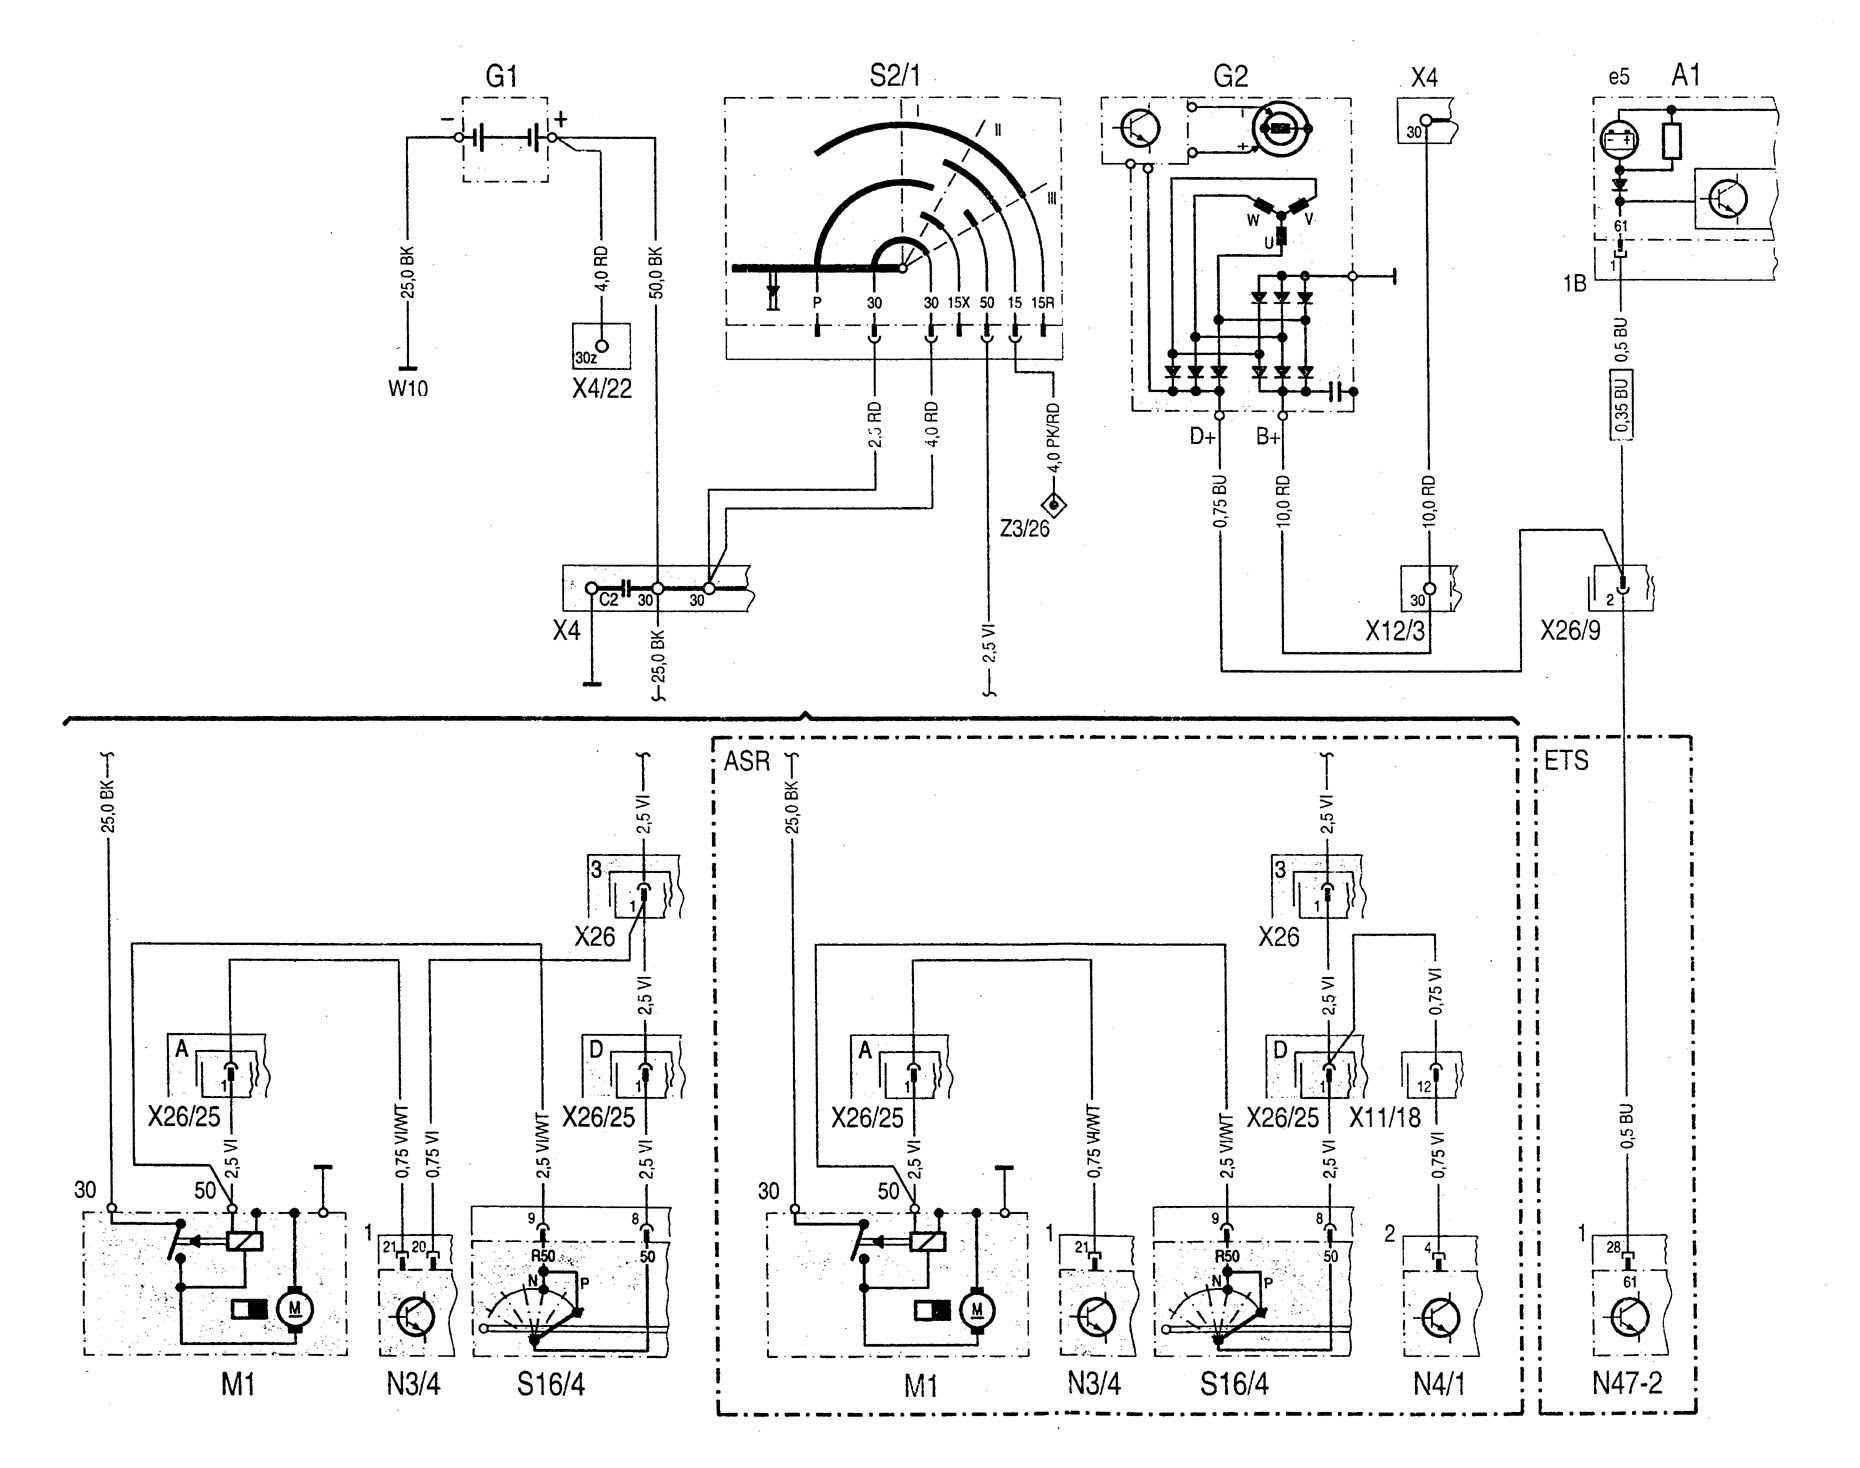 Mercedes-Benz C280 (1994 - 1997) - wiring diagrams ...